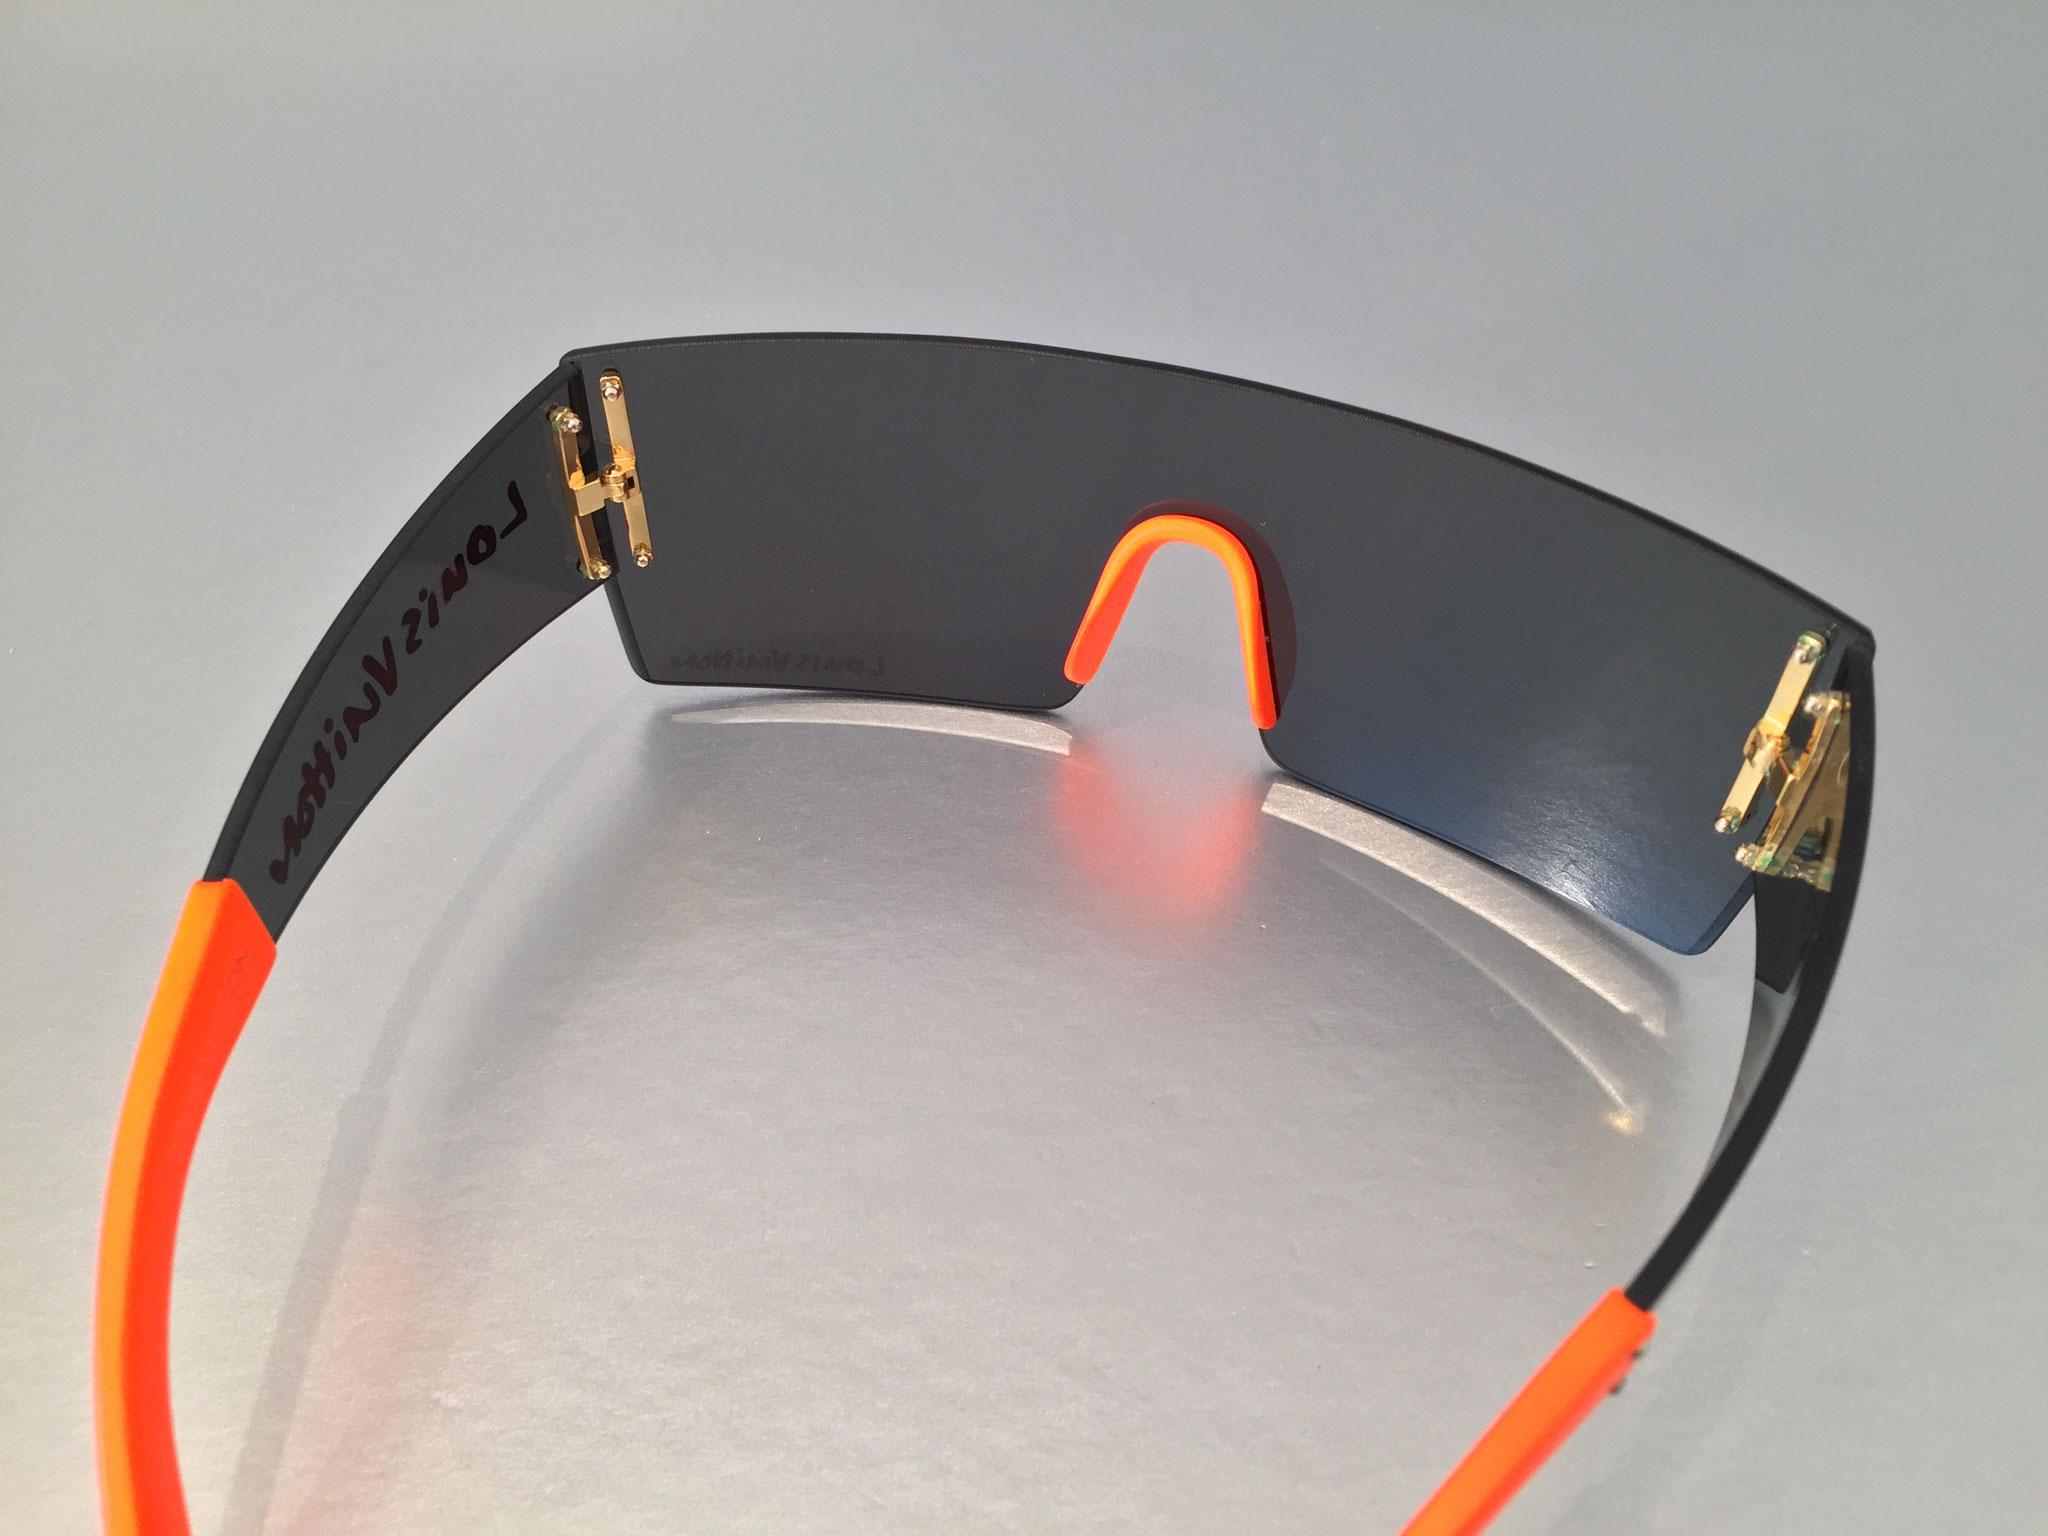 1f6e97823c3 Louis Vuitton Graffiti Frame Sonnenbrille in Orange - Ankauf ...